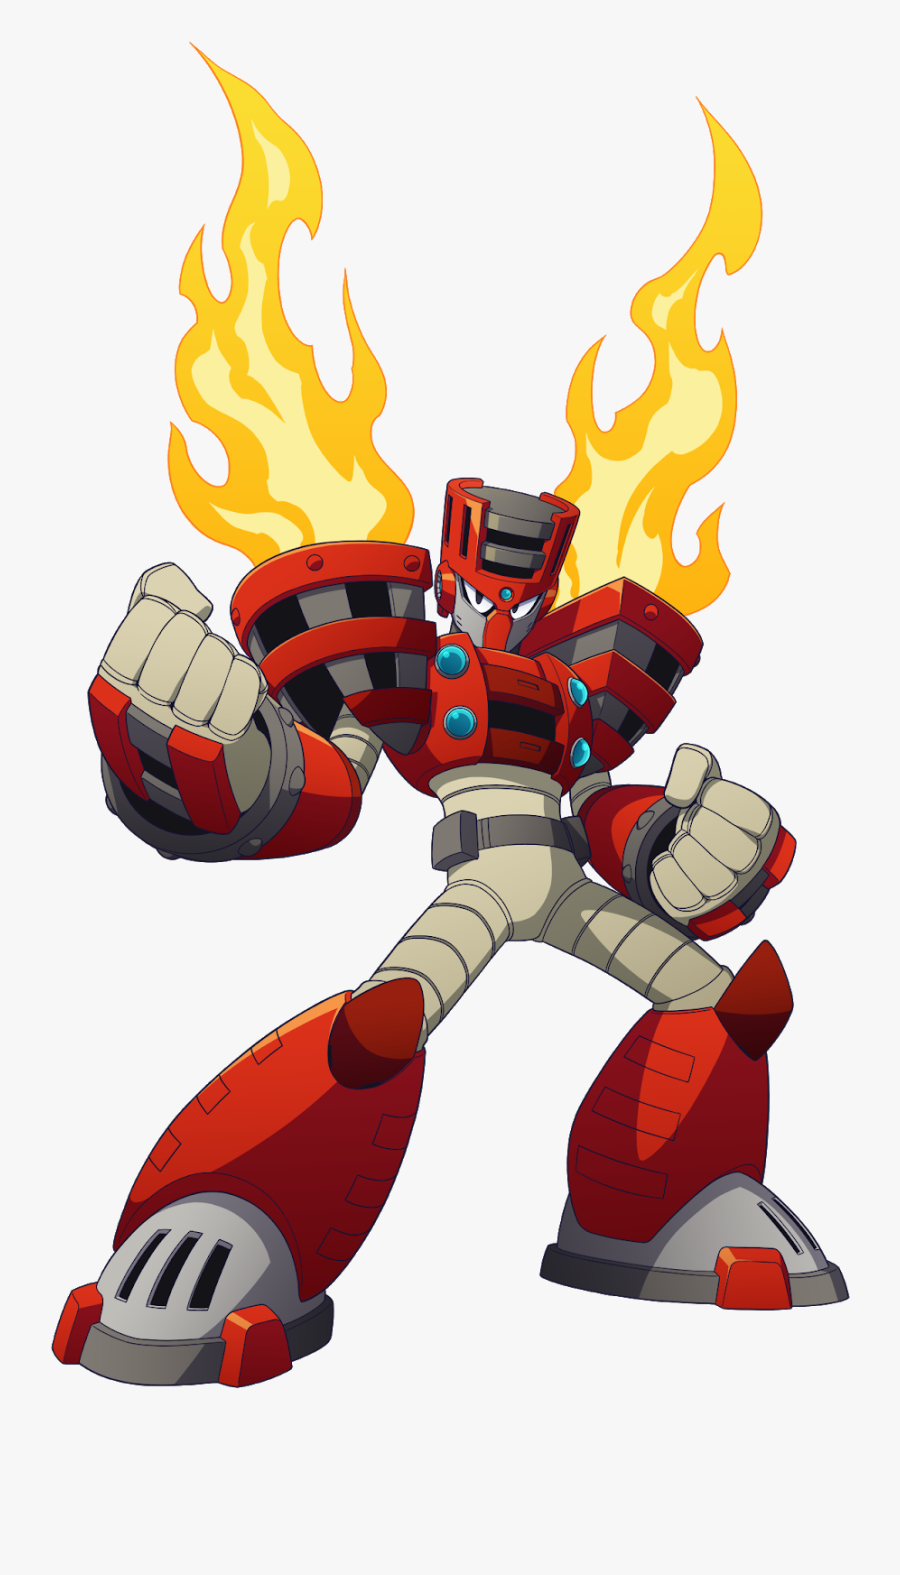 Torch Man2 - Mega Man 11 Boss, Transparent Clipart